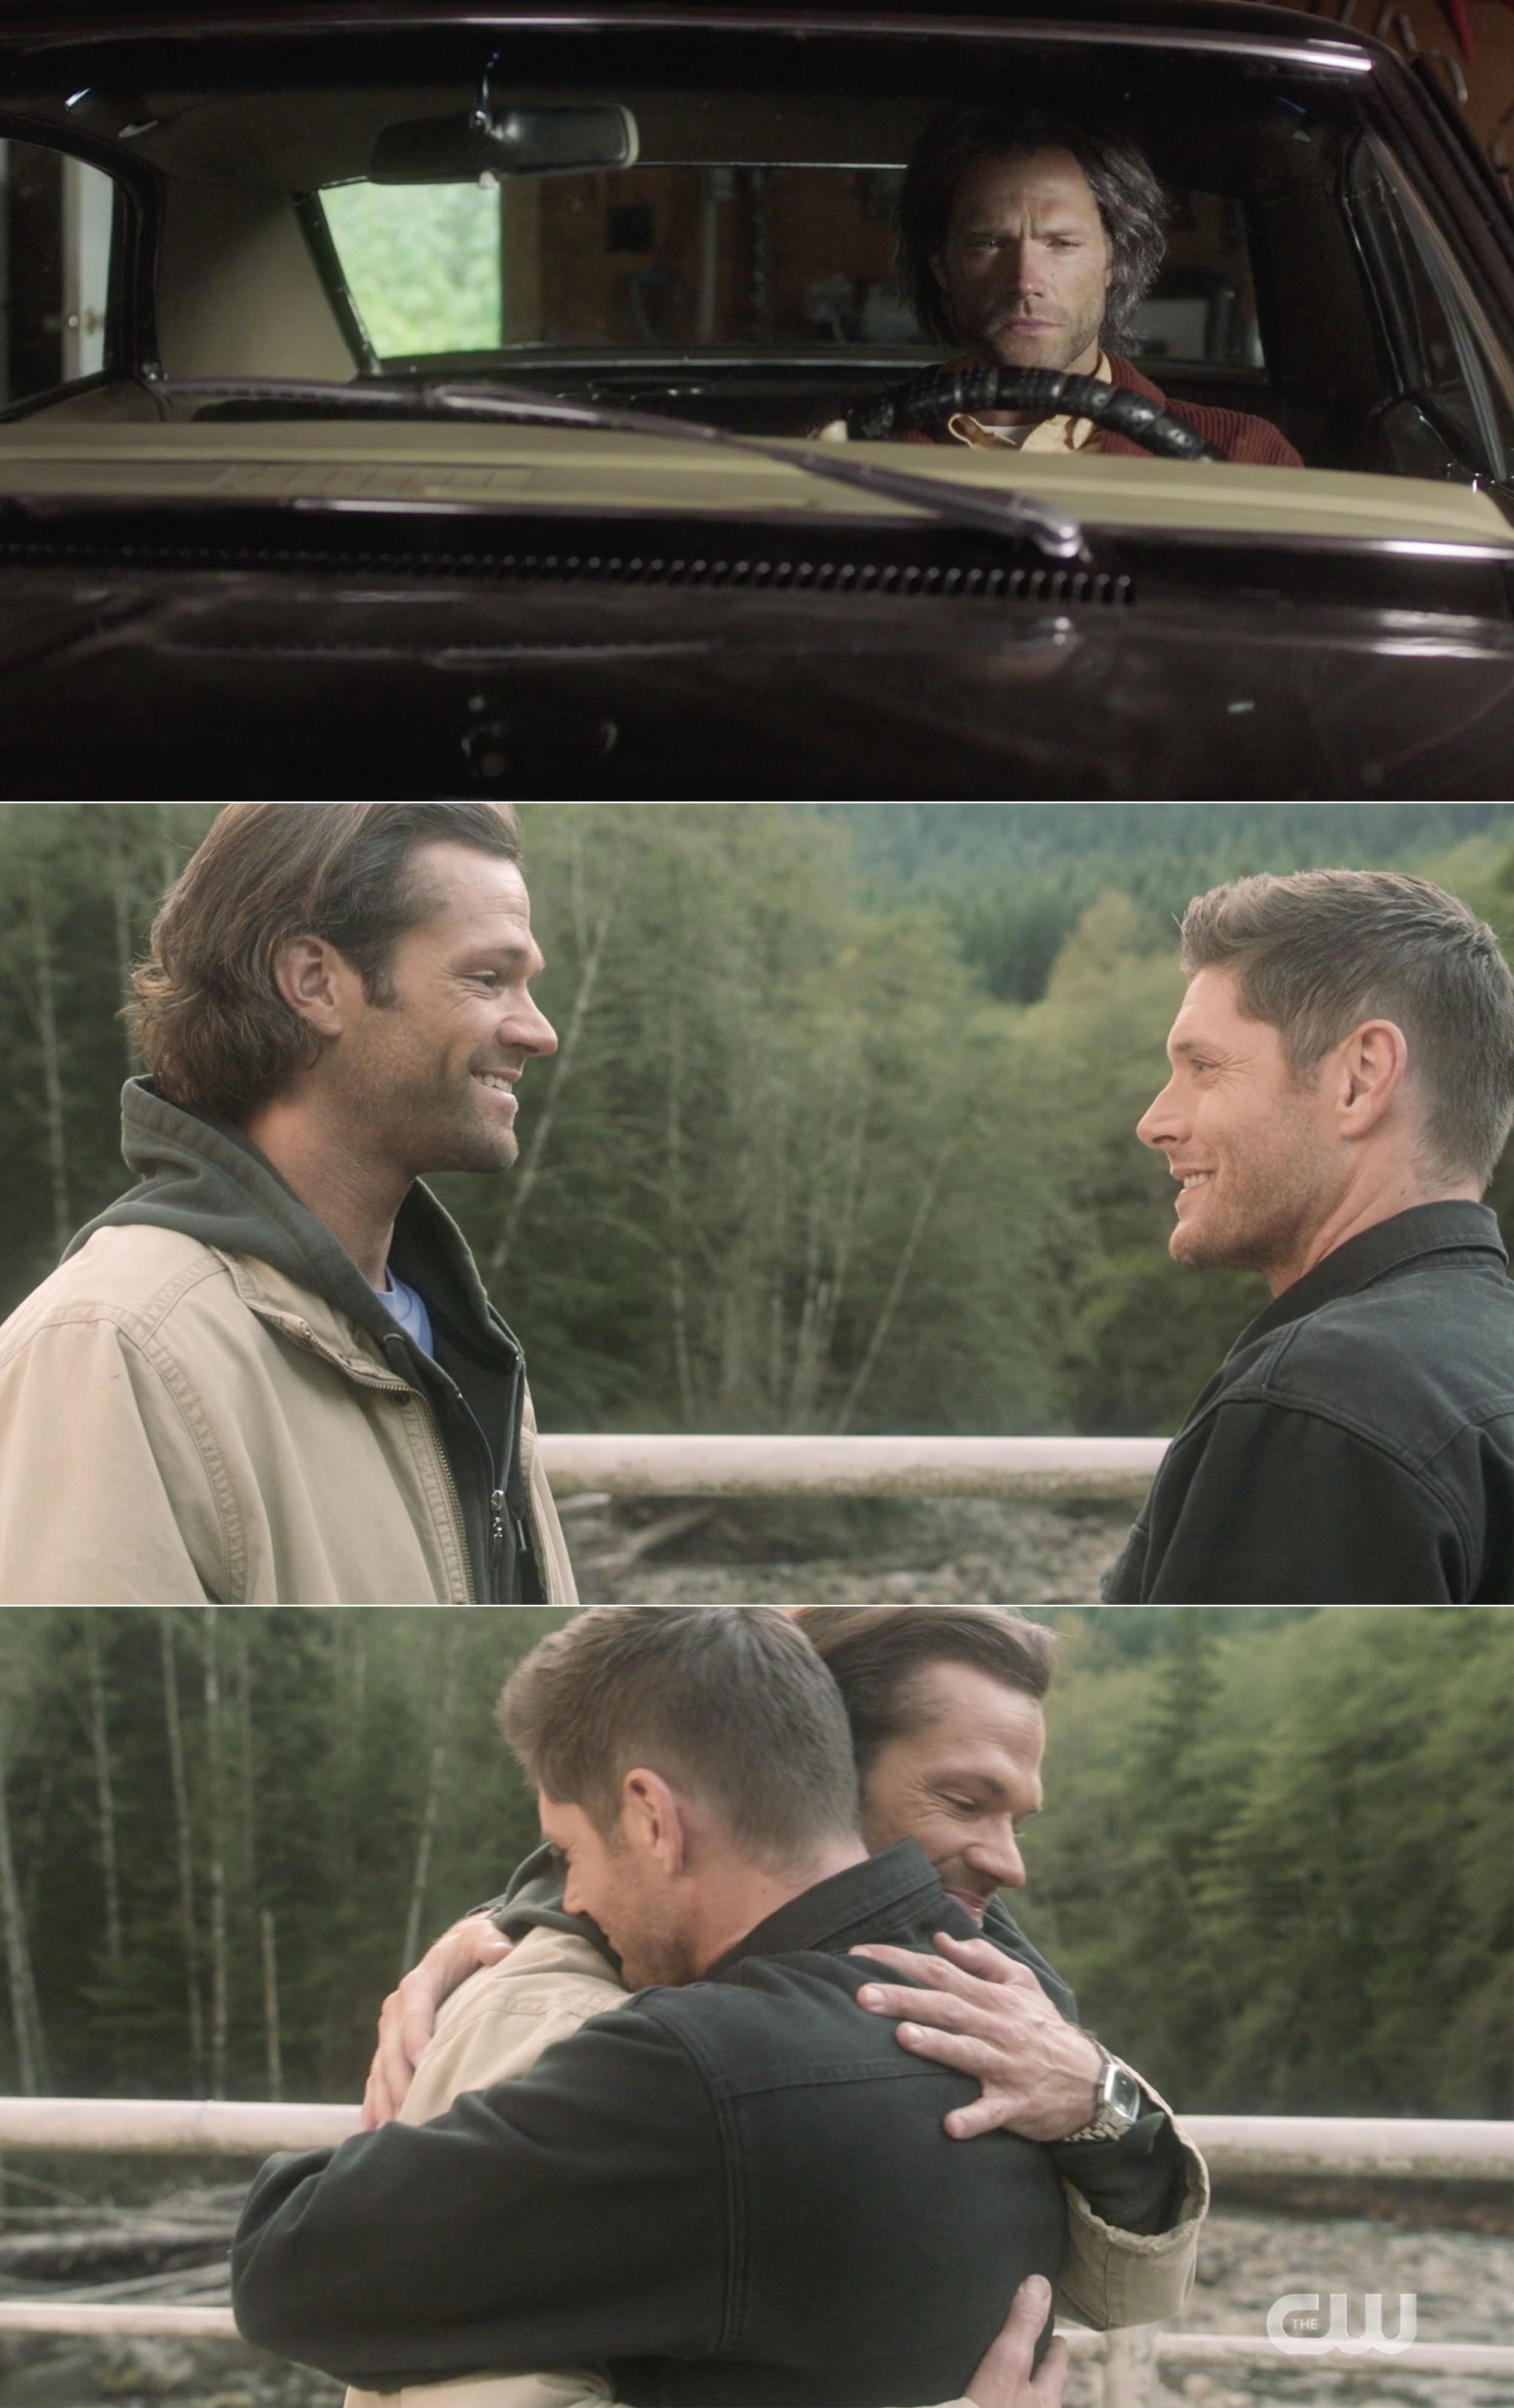 Sam and Dean hugging